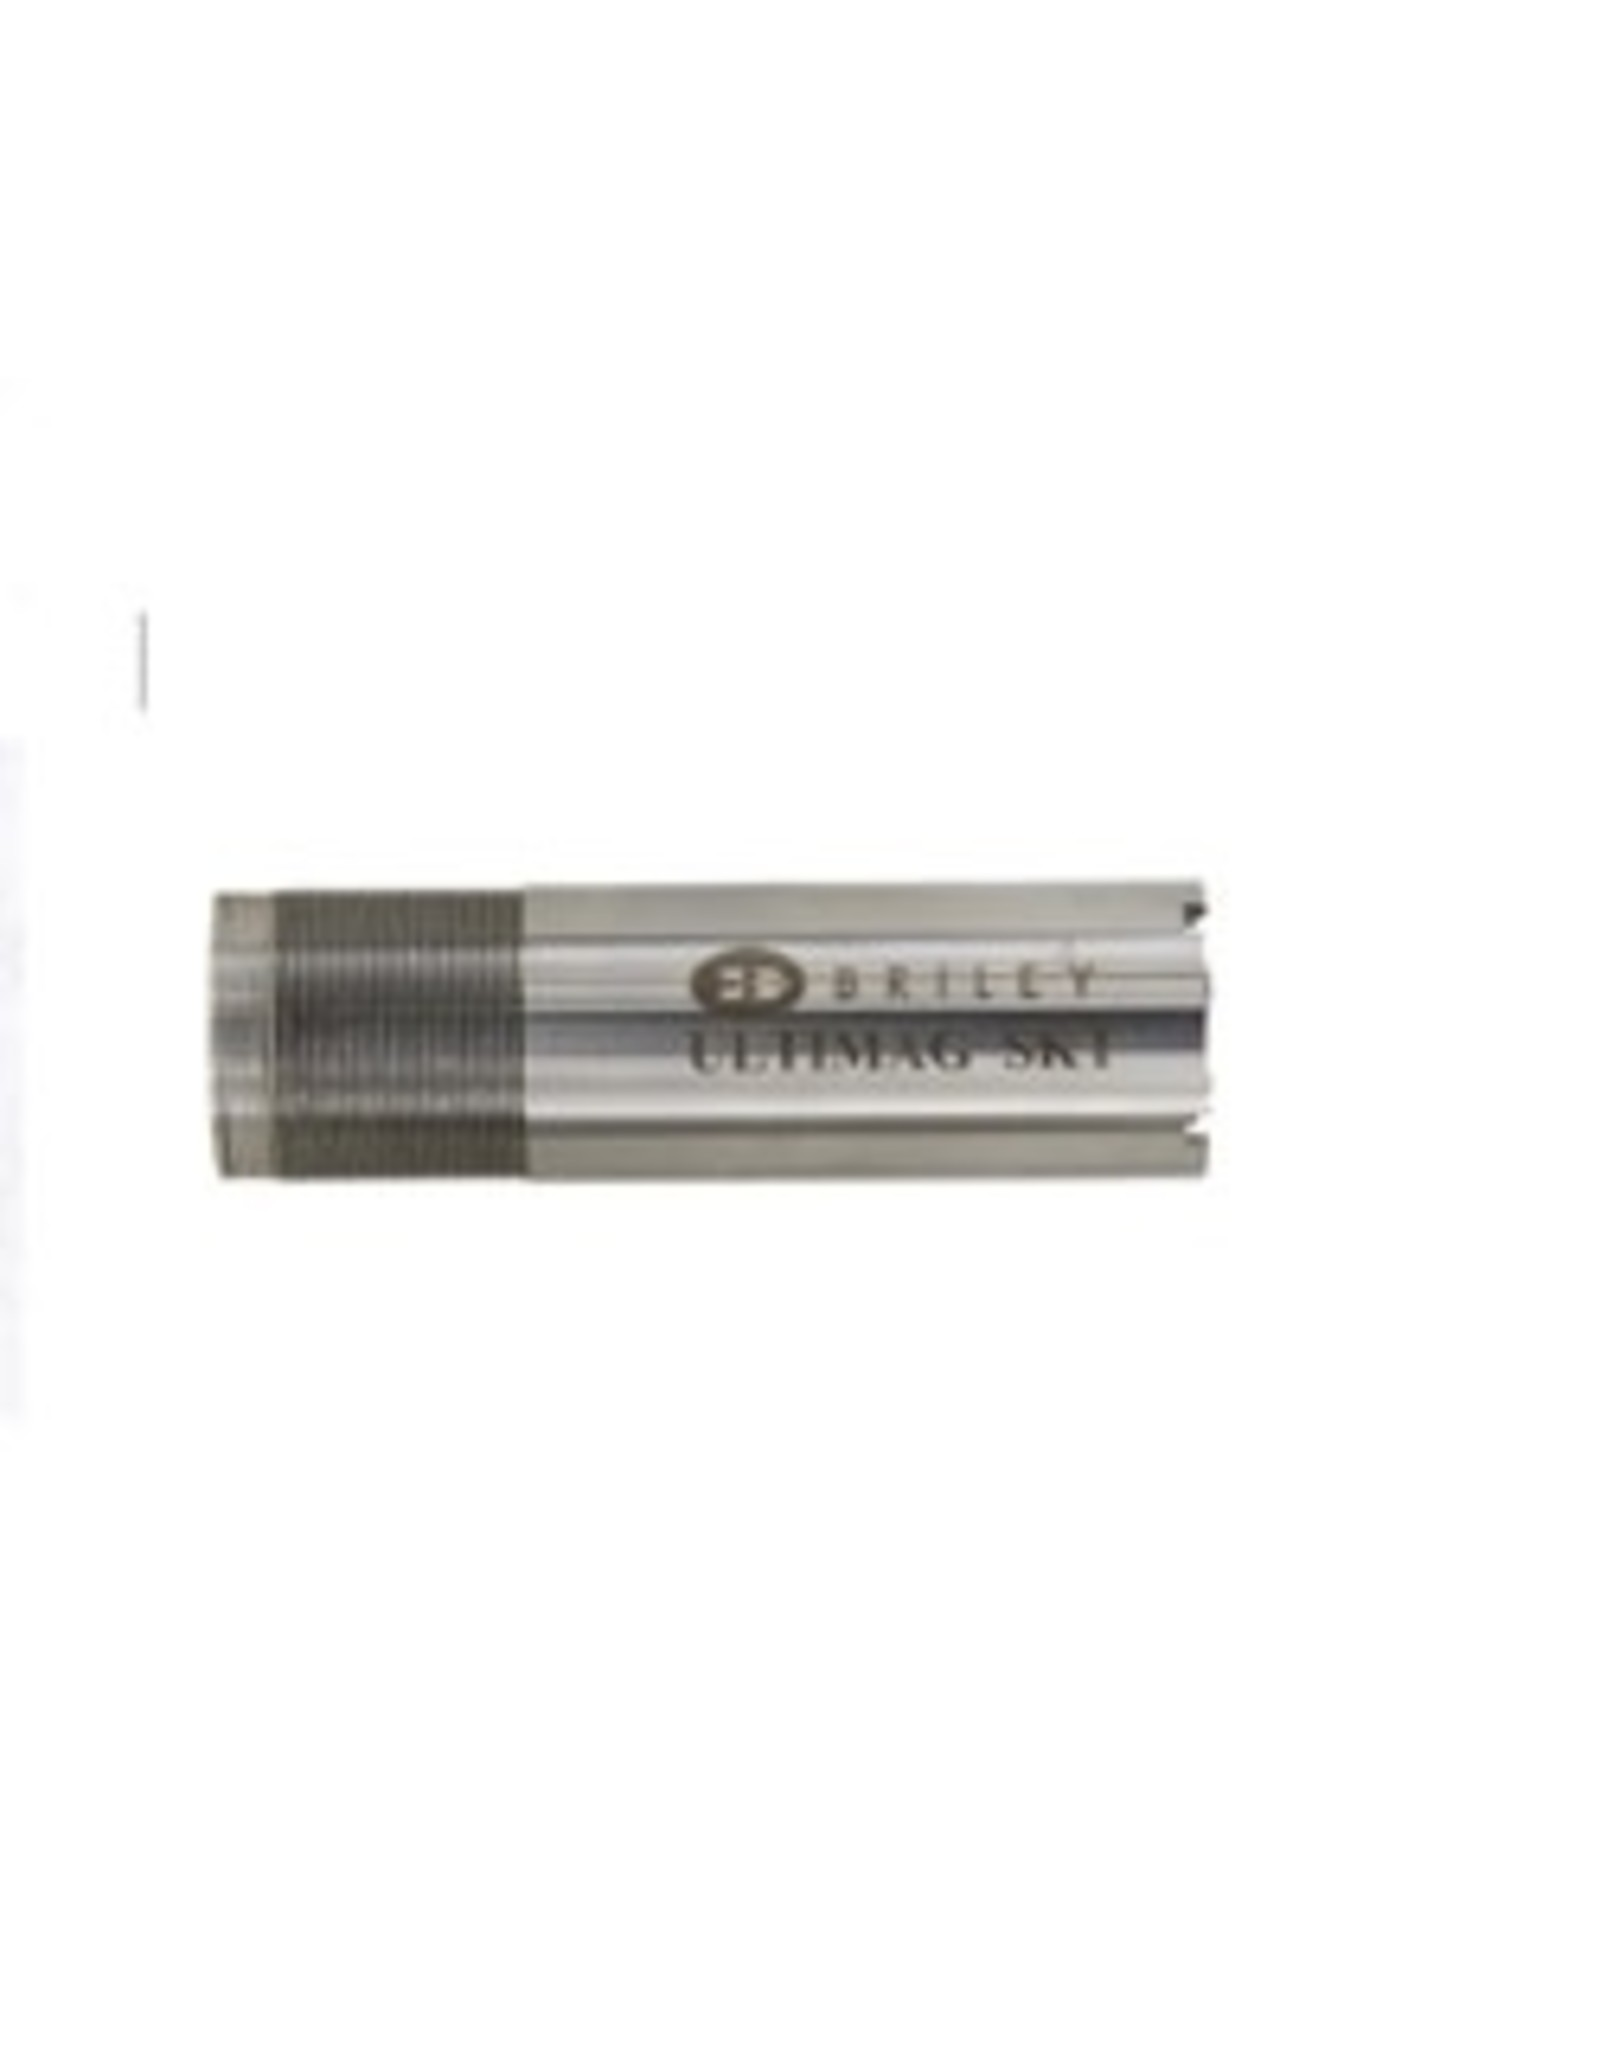 Briley 12 ga Flush Mossberg Ulti-Mag - Light Modified